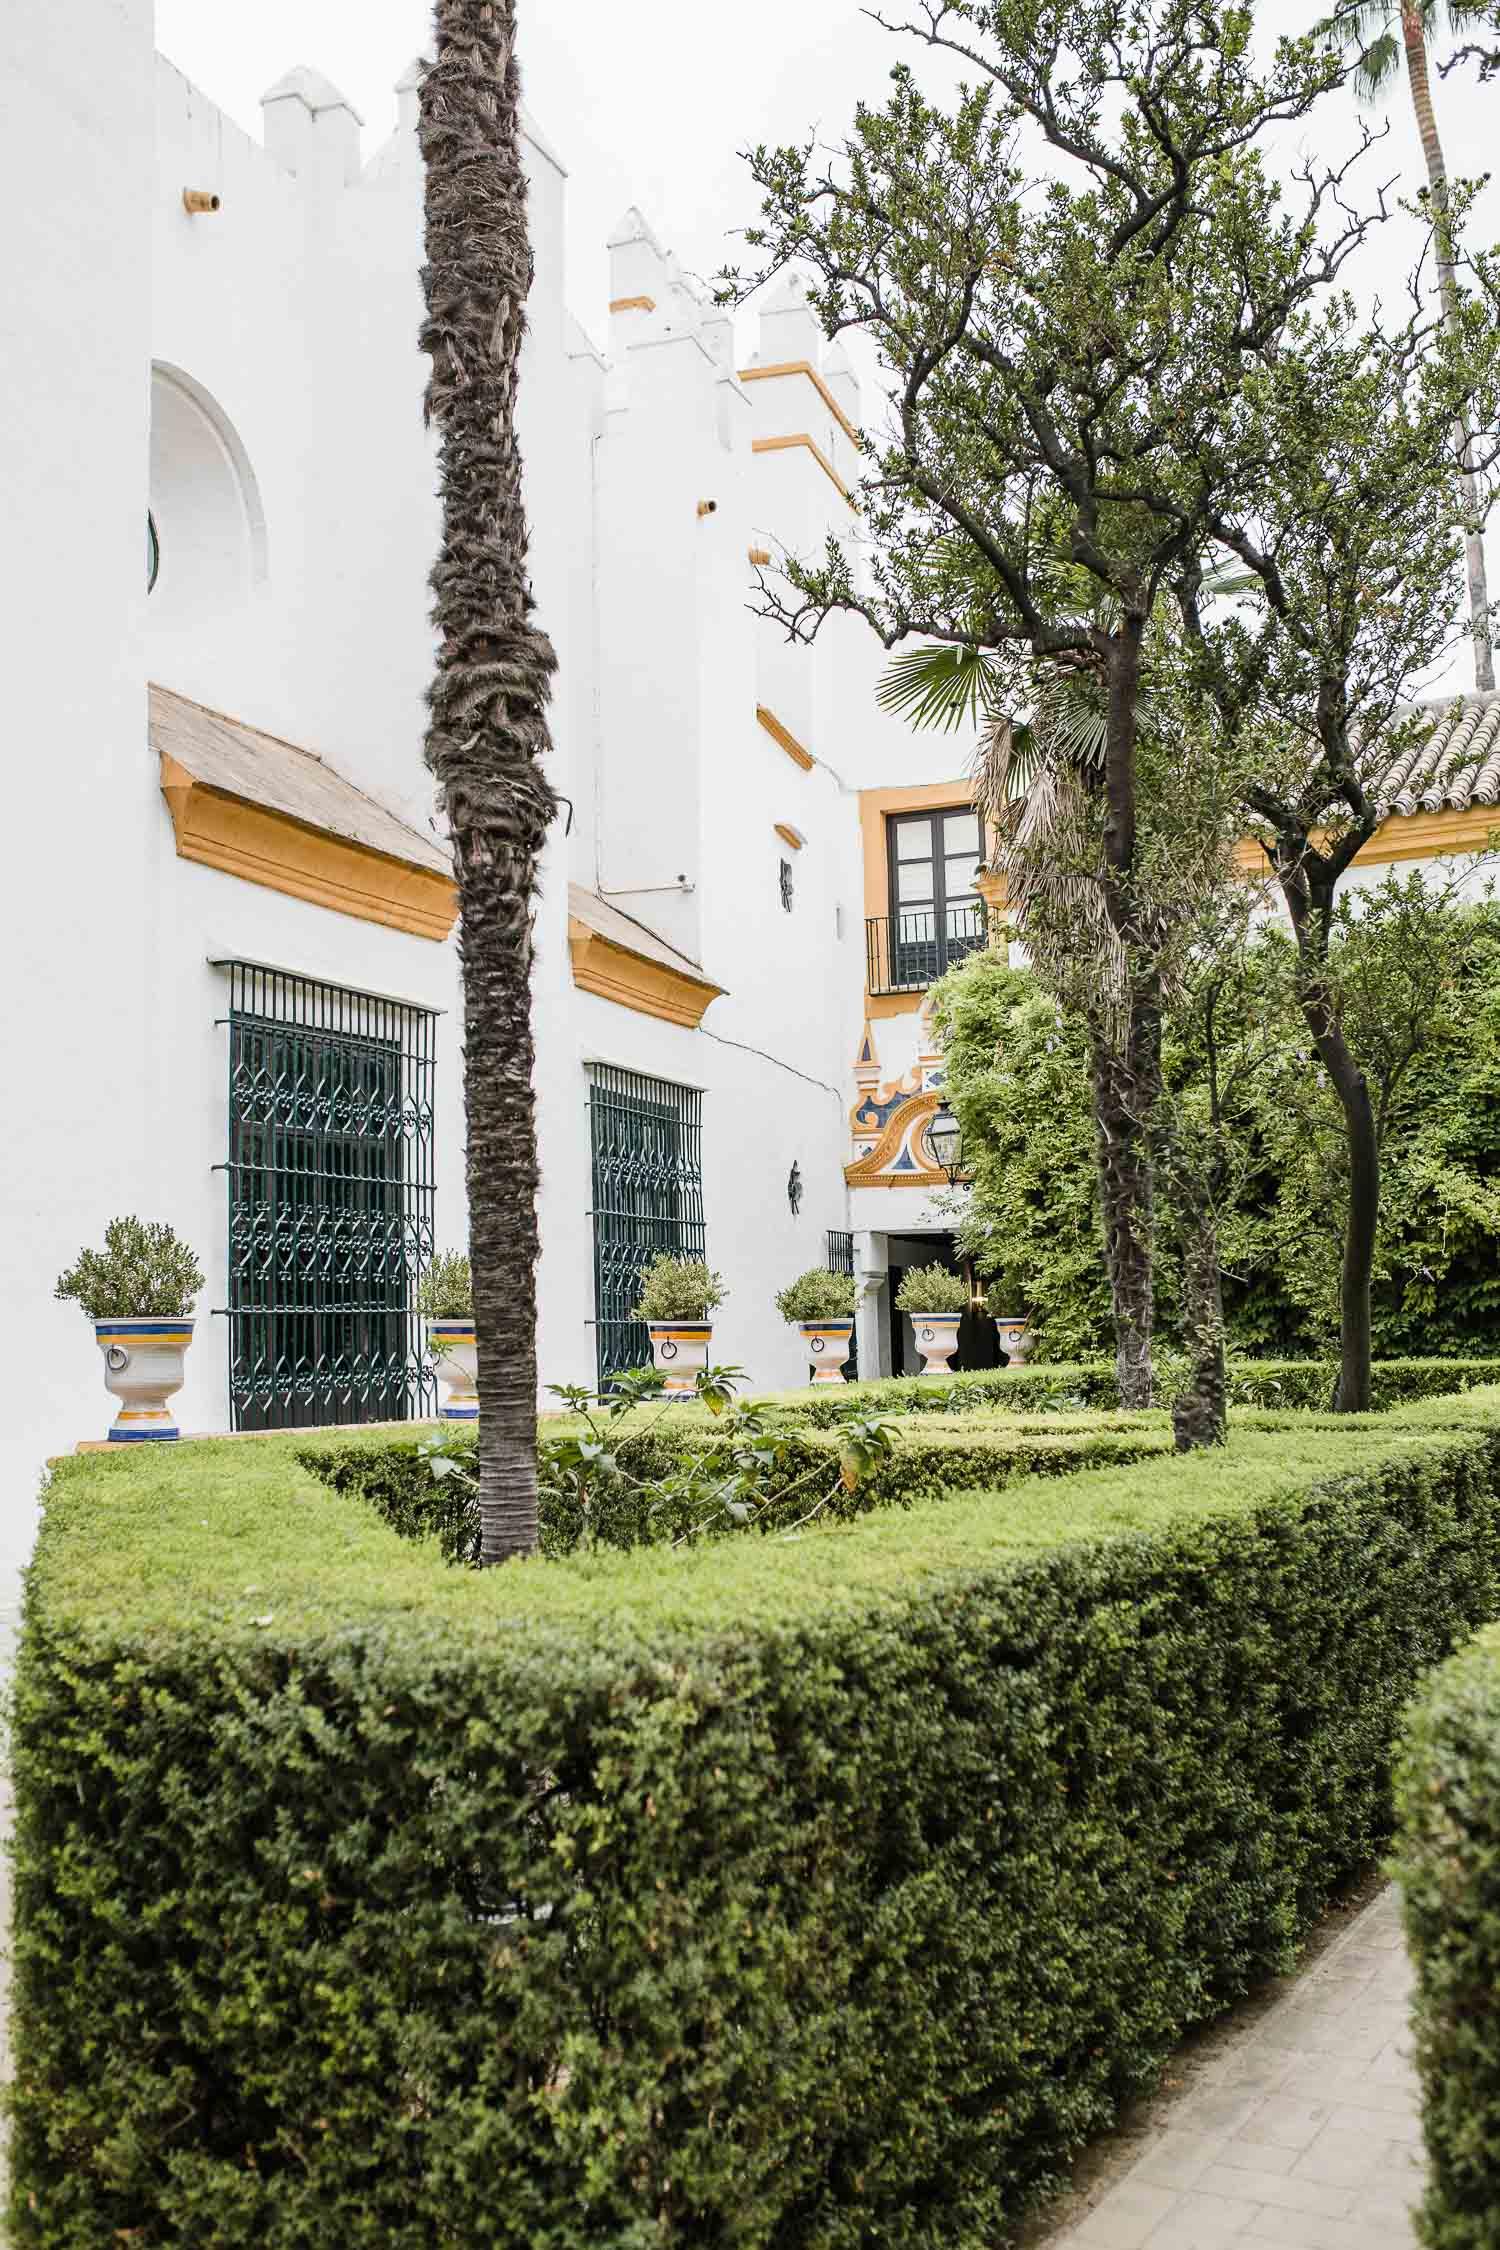 buildings in Sevilla